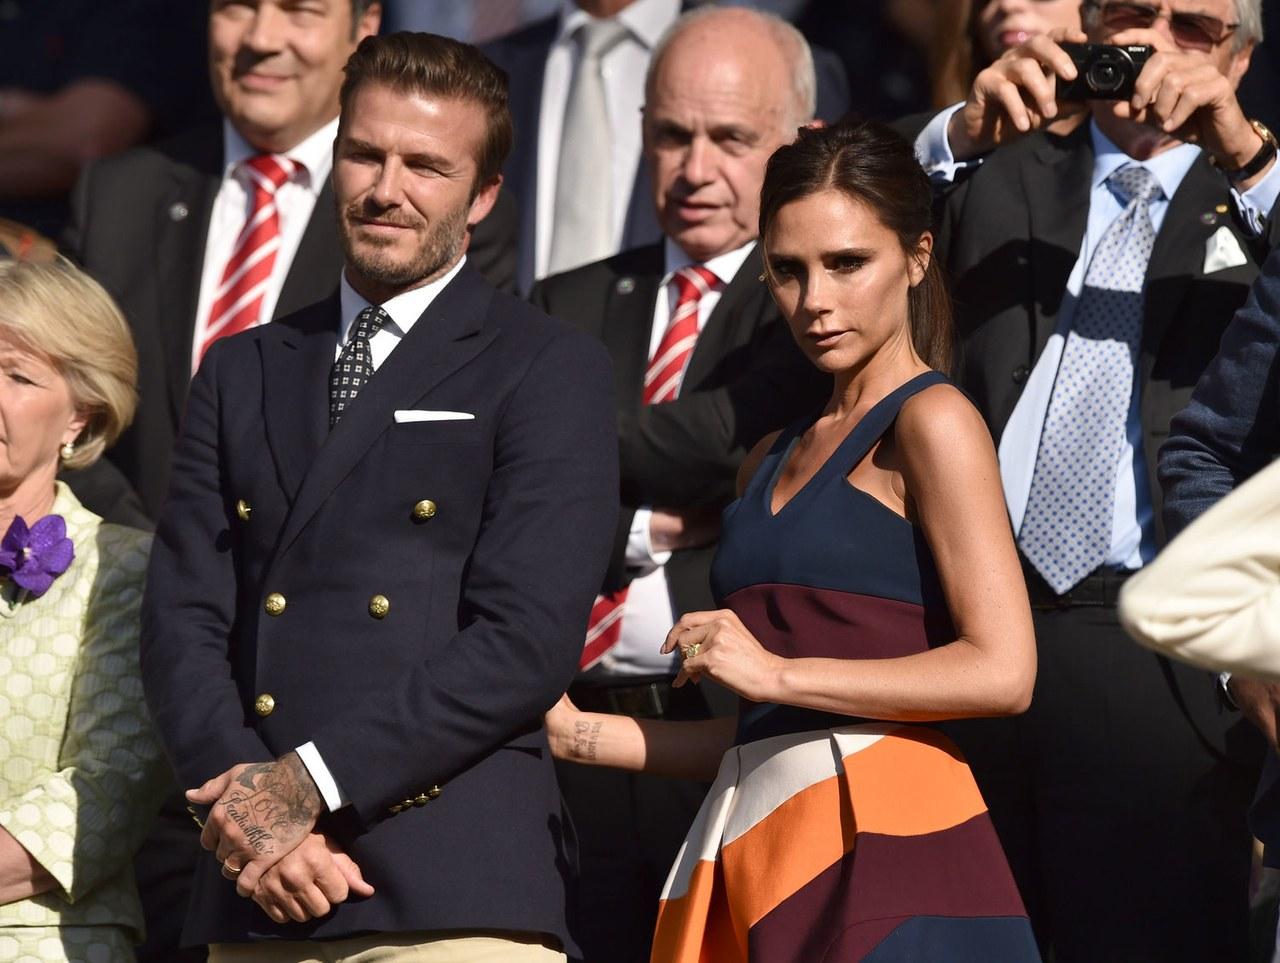 2. David and Victoria Beckham